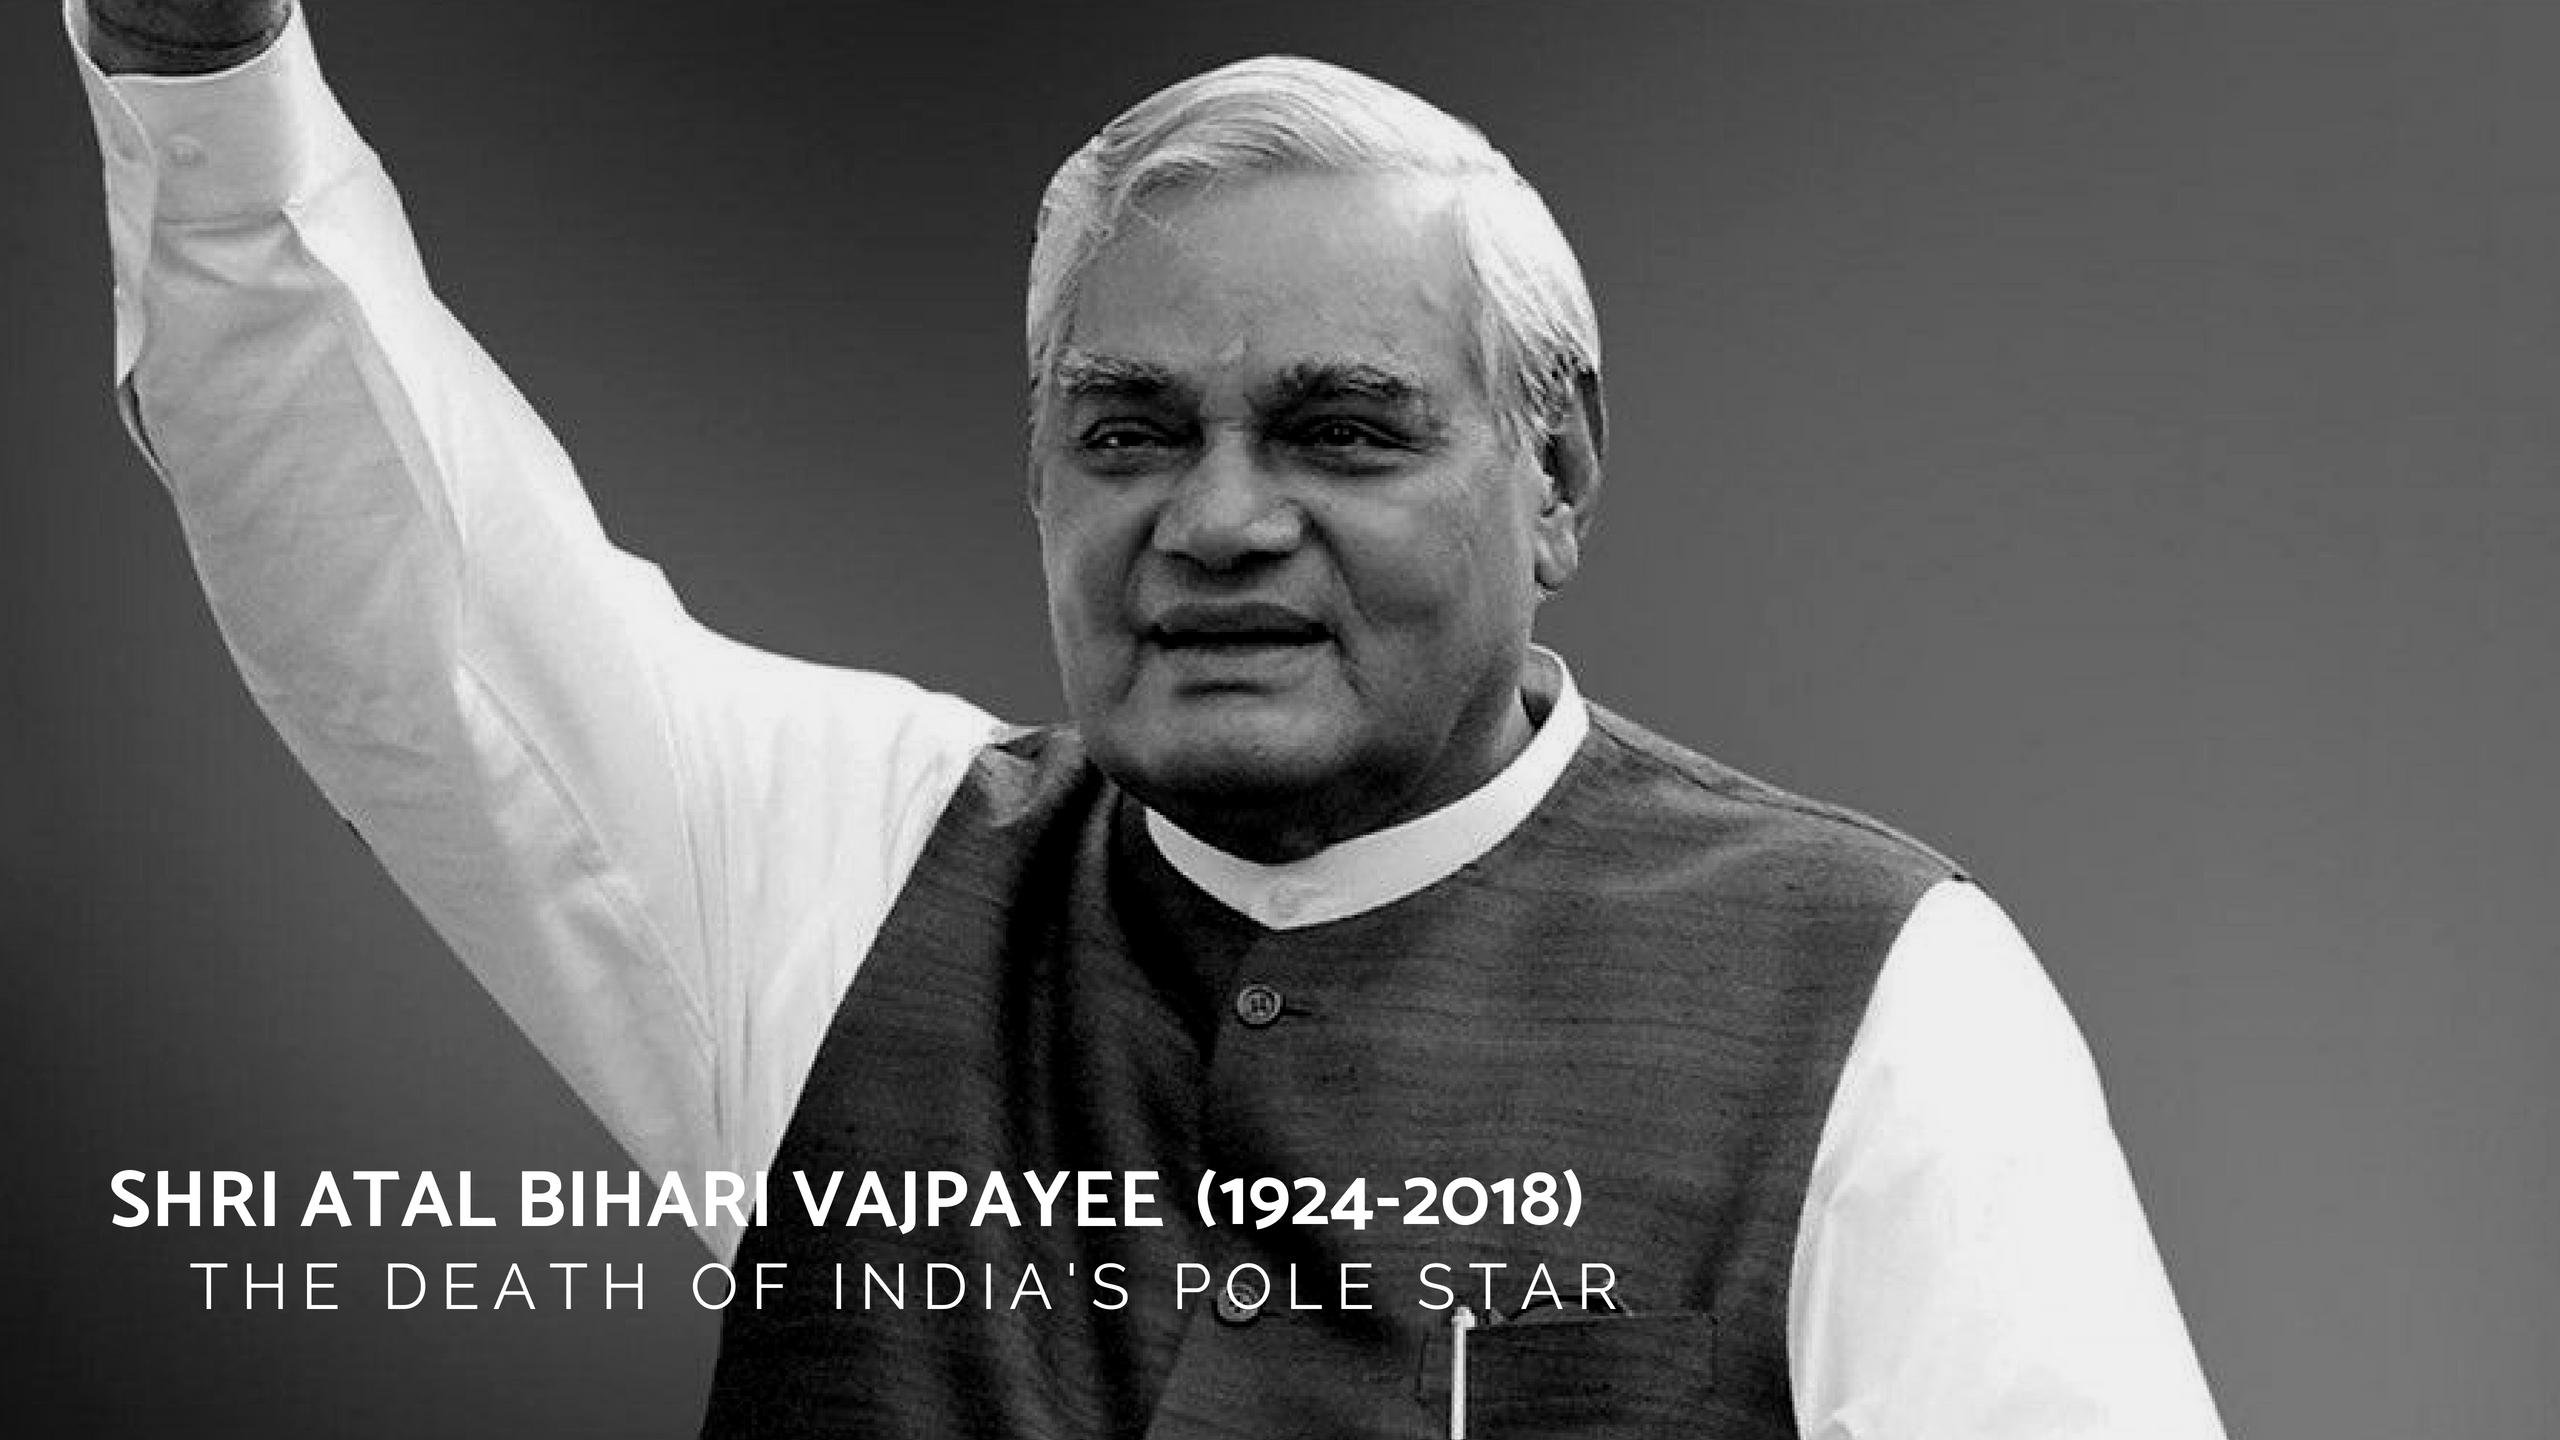 Atal Bihari Vajpayee: The Death of India's Pole Star